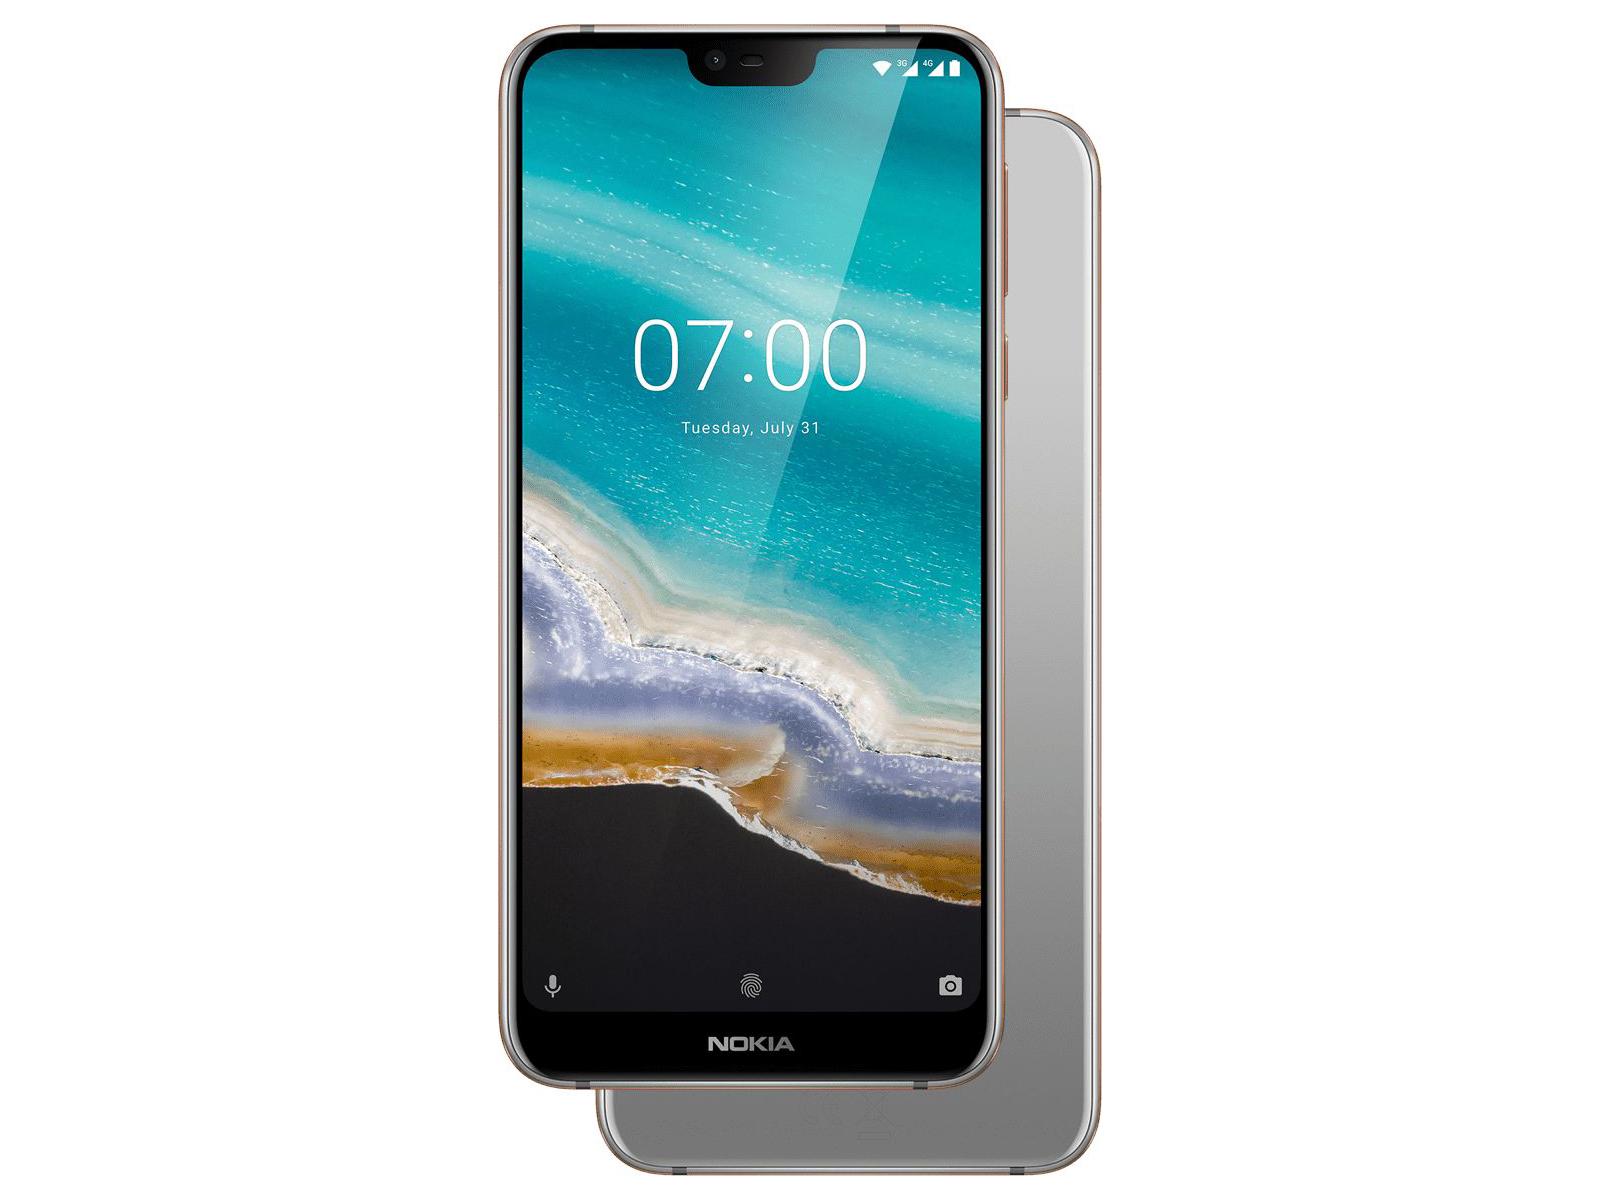 Nokia 7 Series - Notebookcheck.net External Reviews f8c978e7af0b9